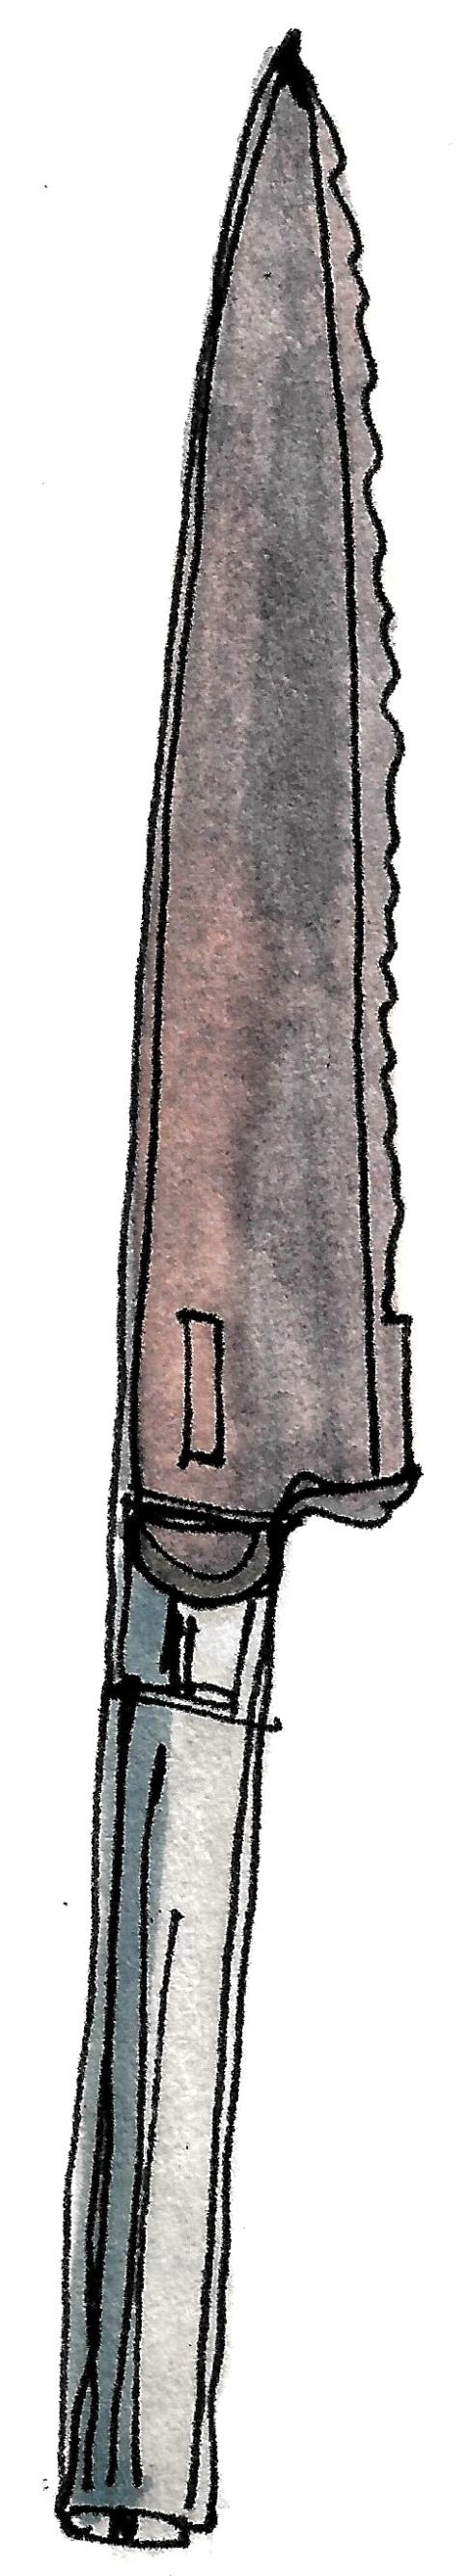 M WOOD KITCHEN KNIFE